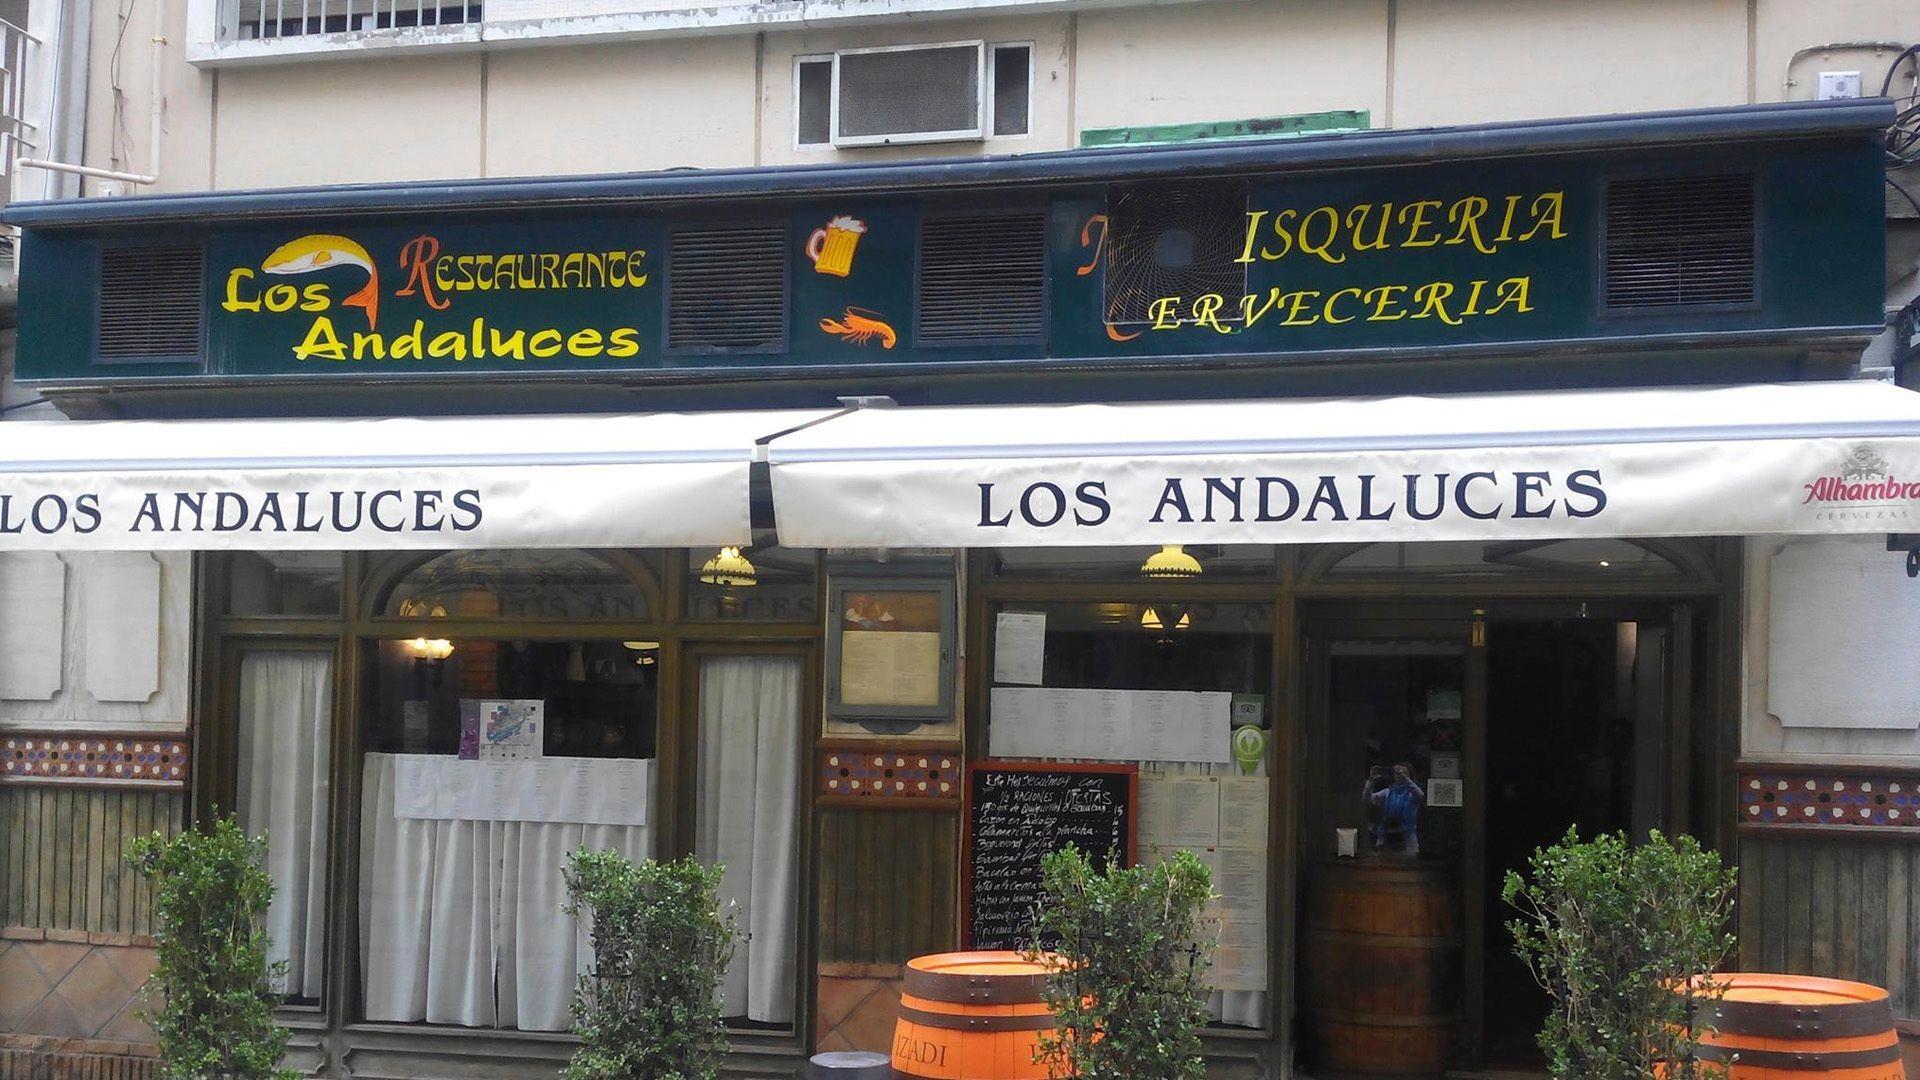 Restaurante de cocina tradicional andaluza en Granada